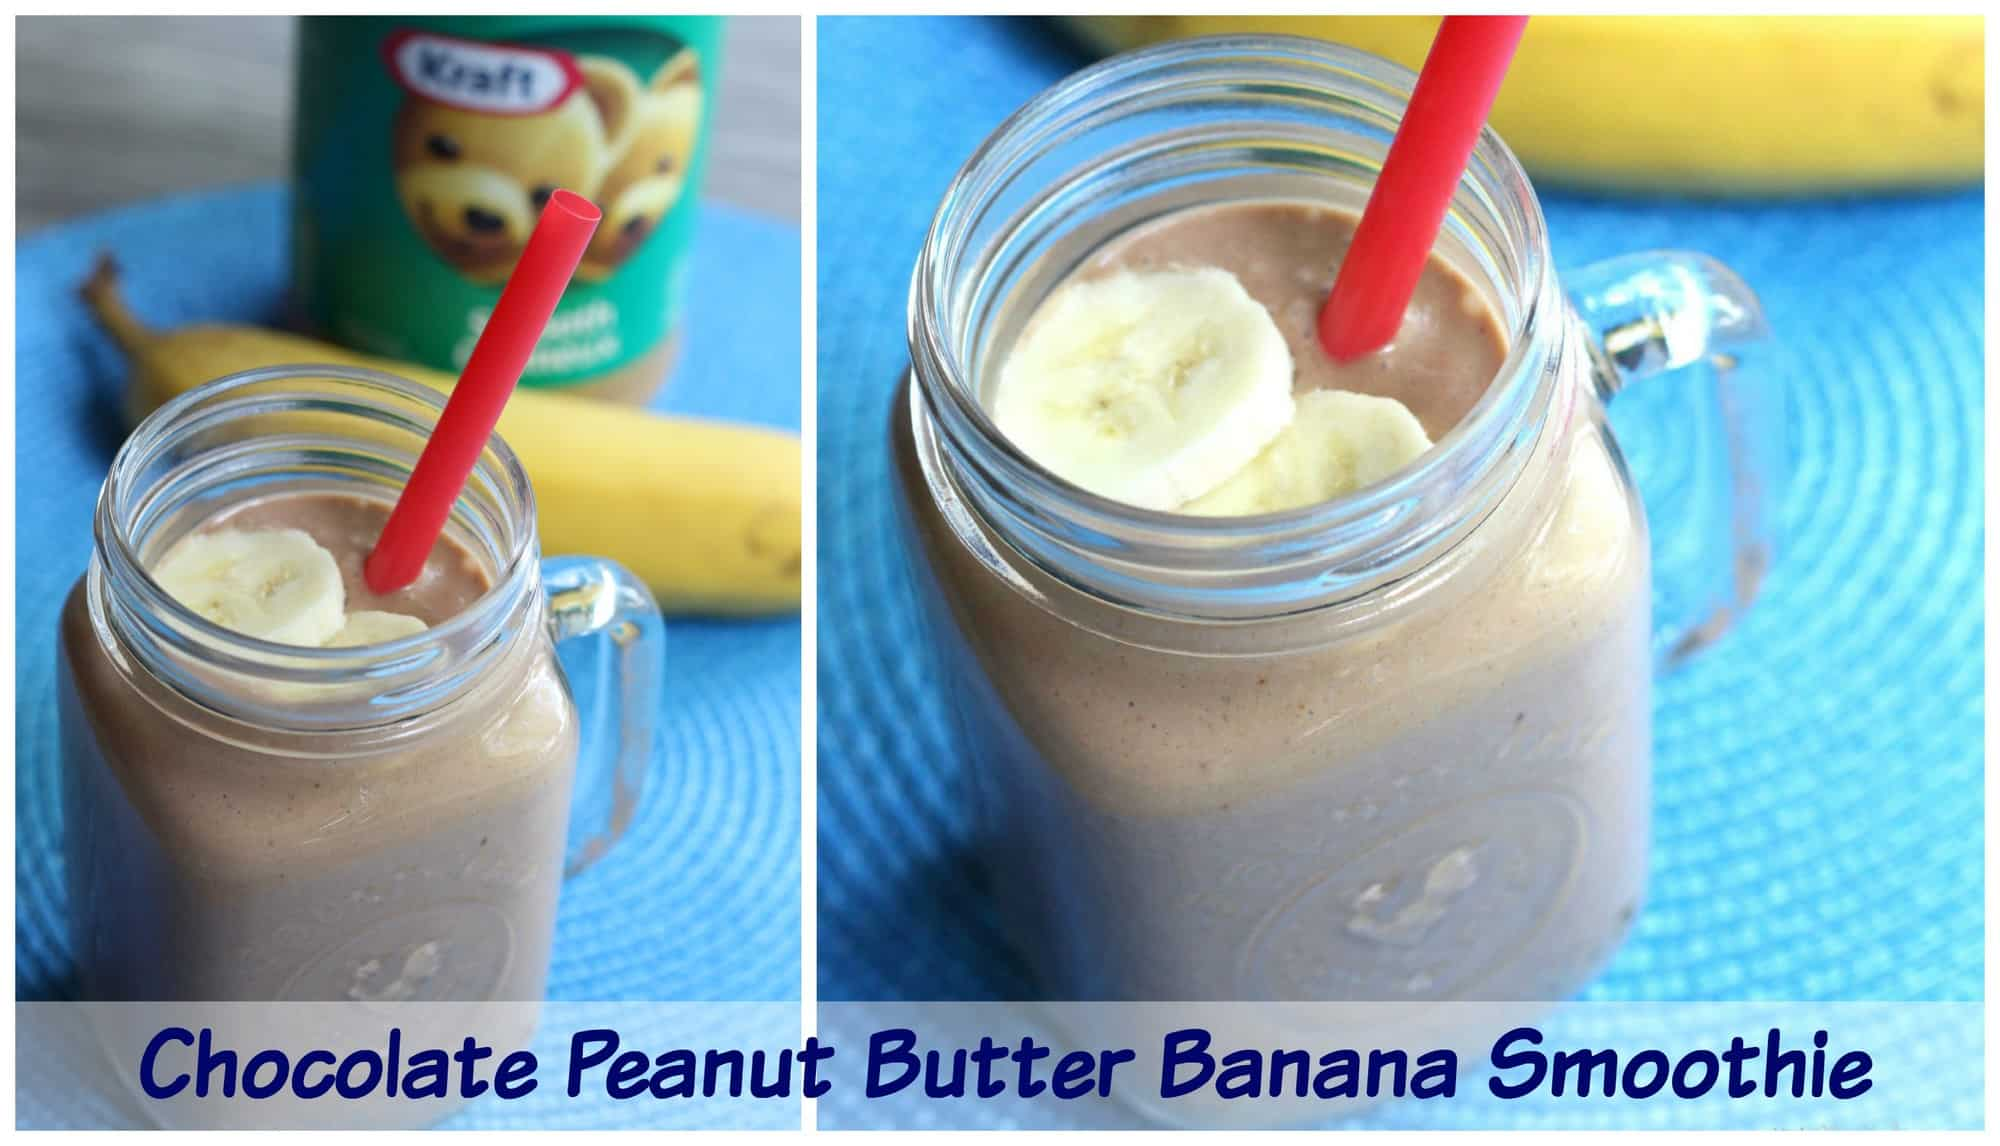 Quick Chocolate Peanut Butter Banana Smoothie Recipe With Yogurt